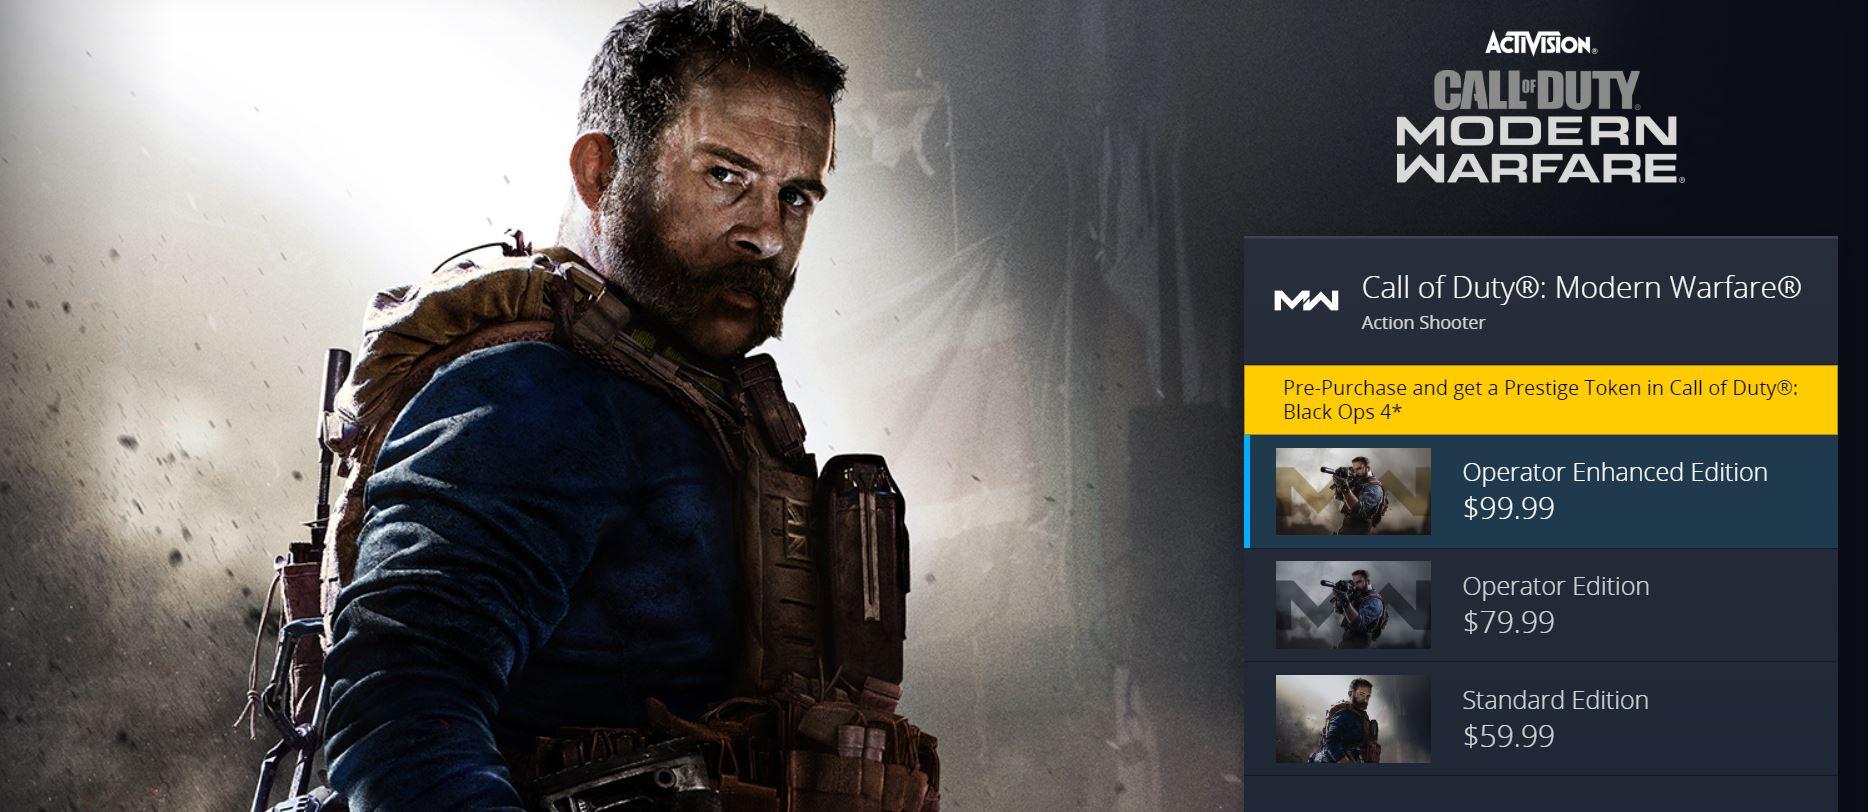 Call of Duty, Modern warfare, Blizzard, Battle net,GamersRD